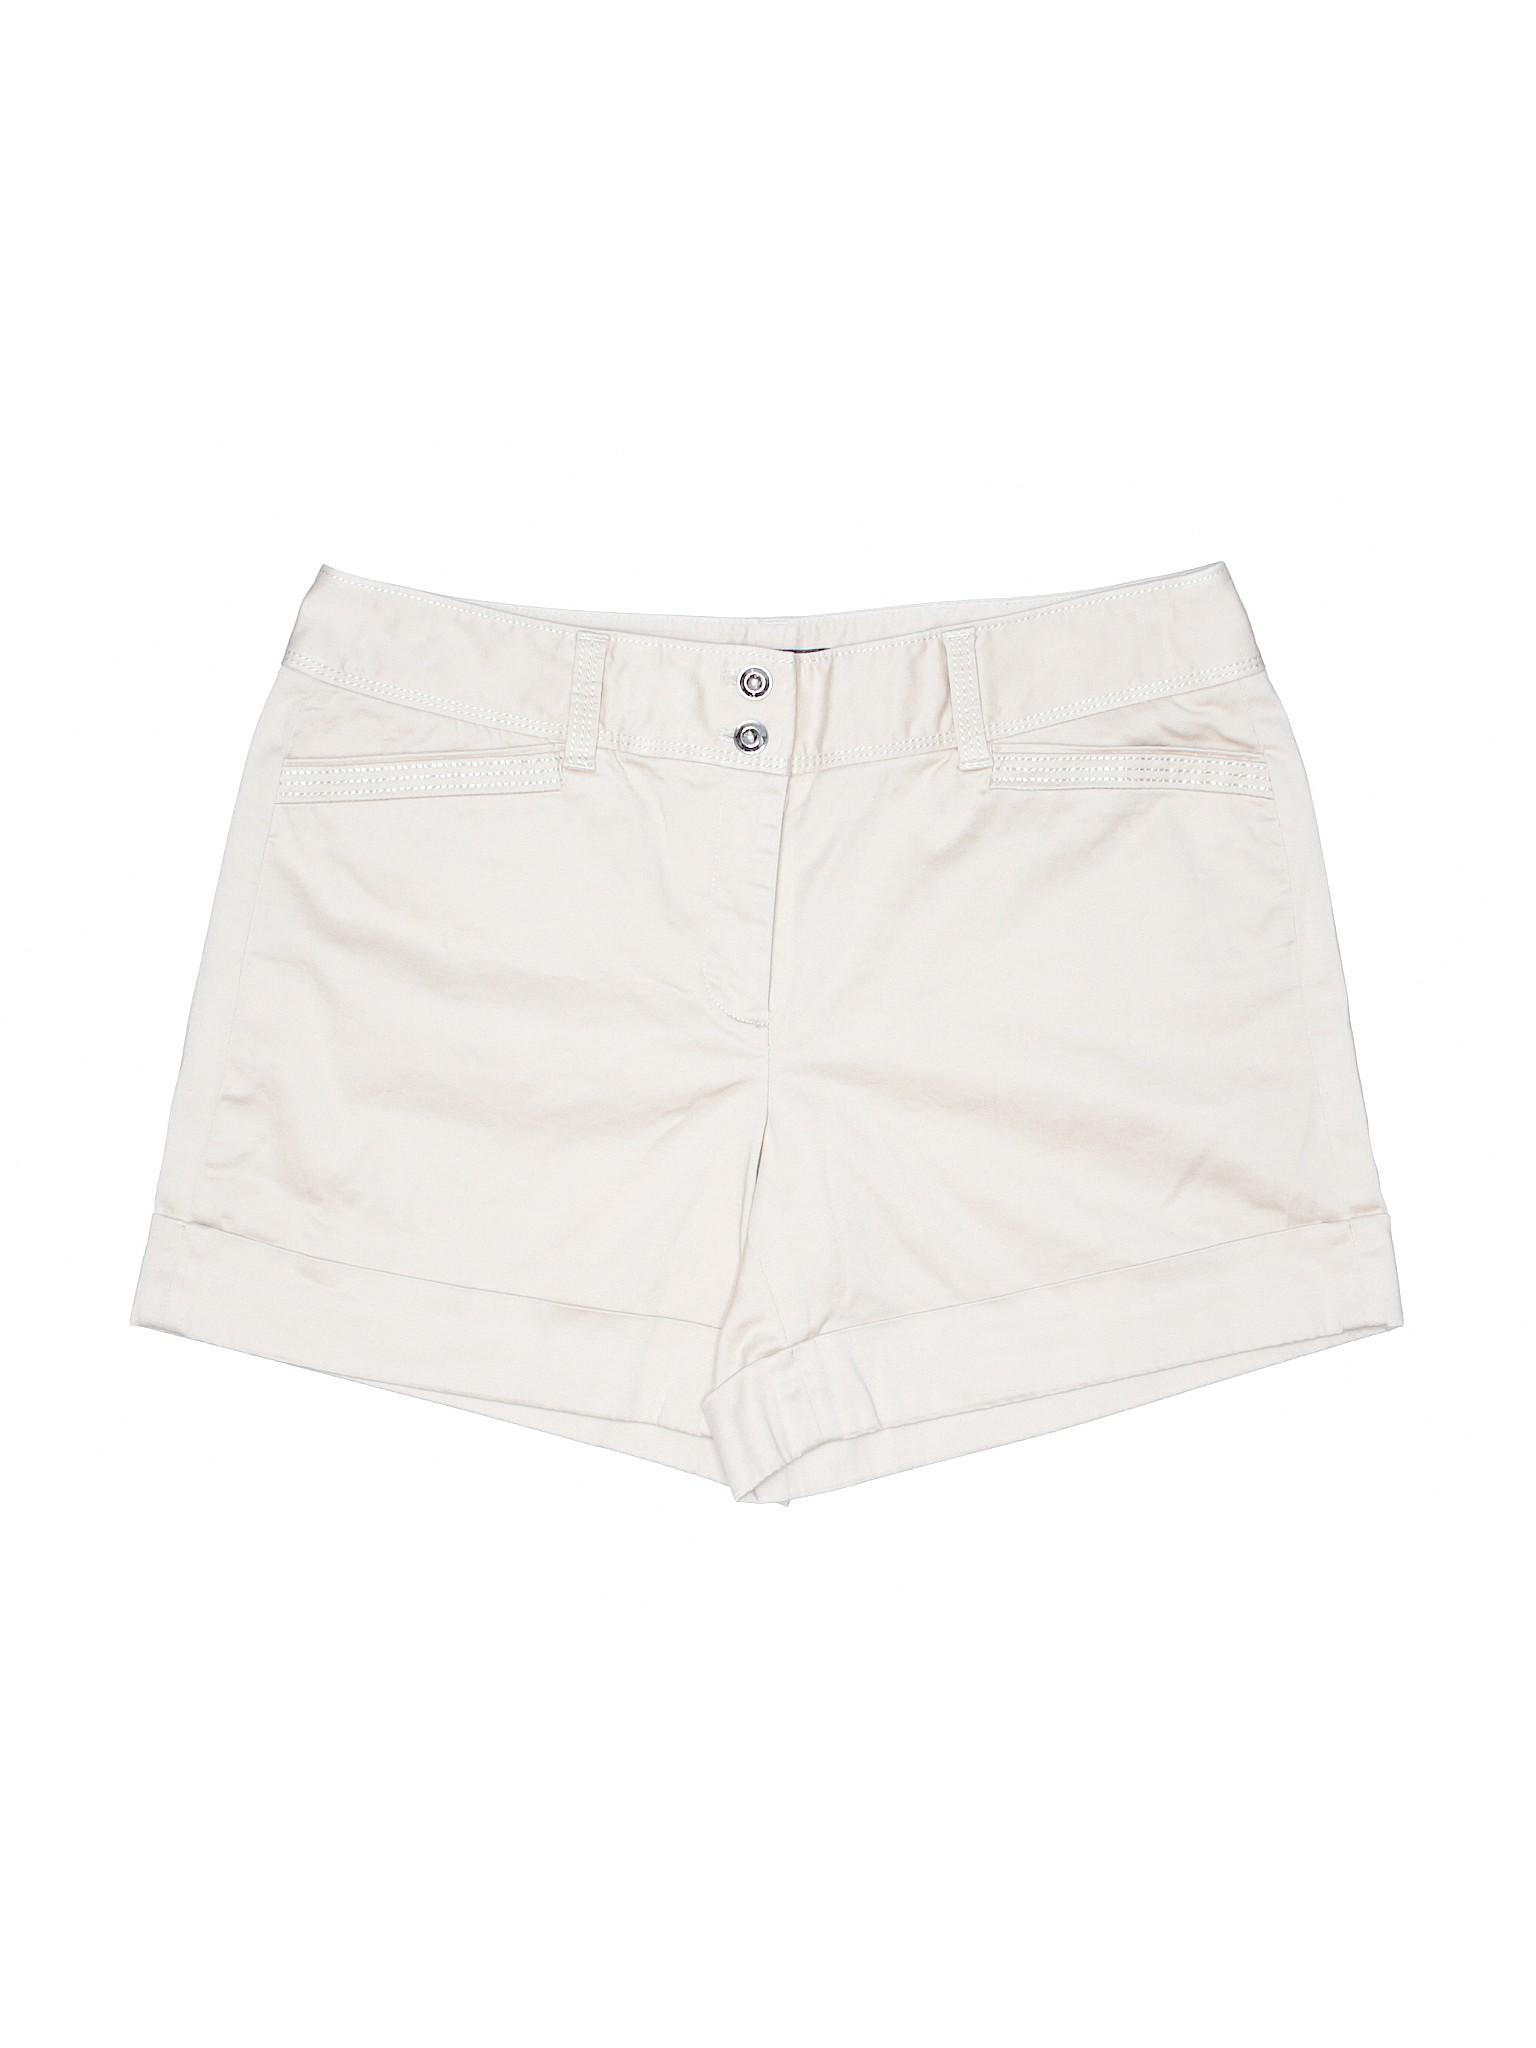 House Black Shorts Market Boutique White Khaki qZw5CCAg